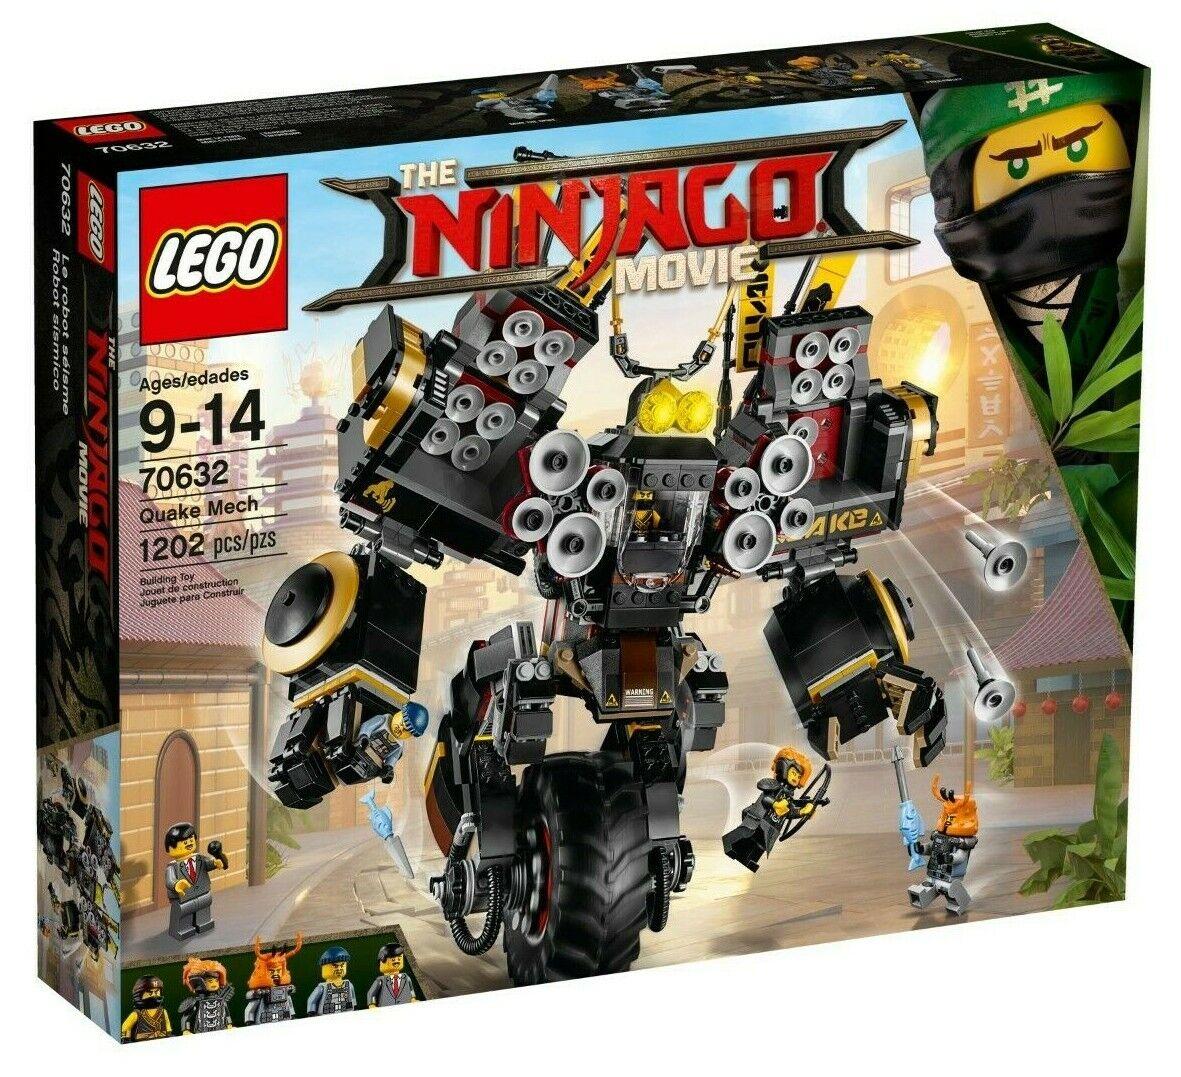 Lego The LEGO Ninjago Movie 70632 Cole's Donner-Mech Neu und original verpackt